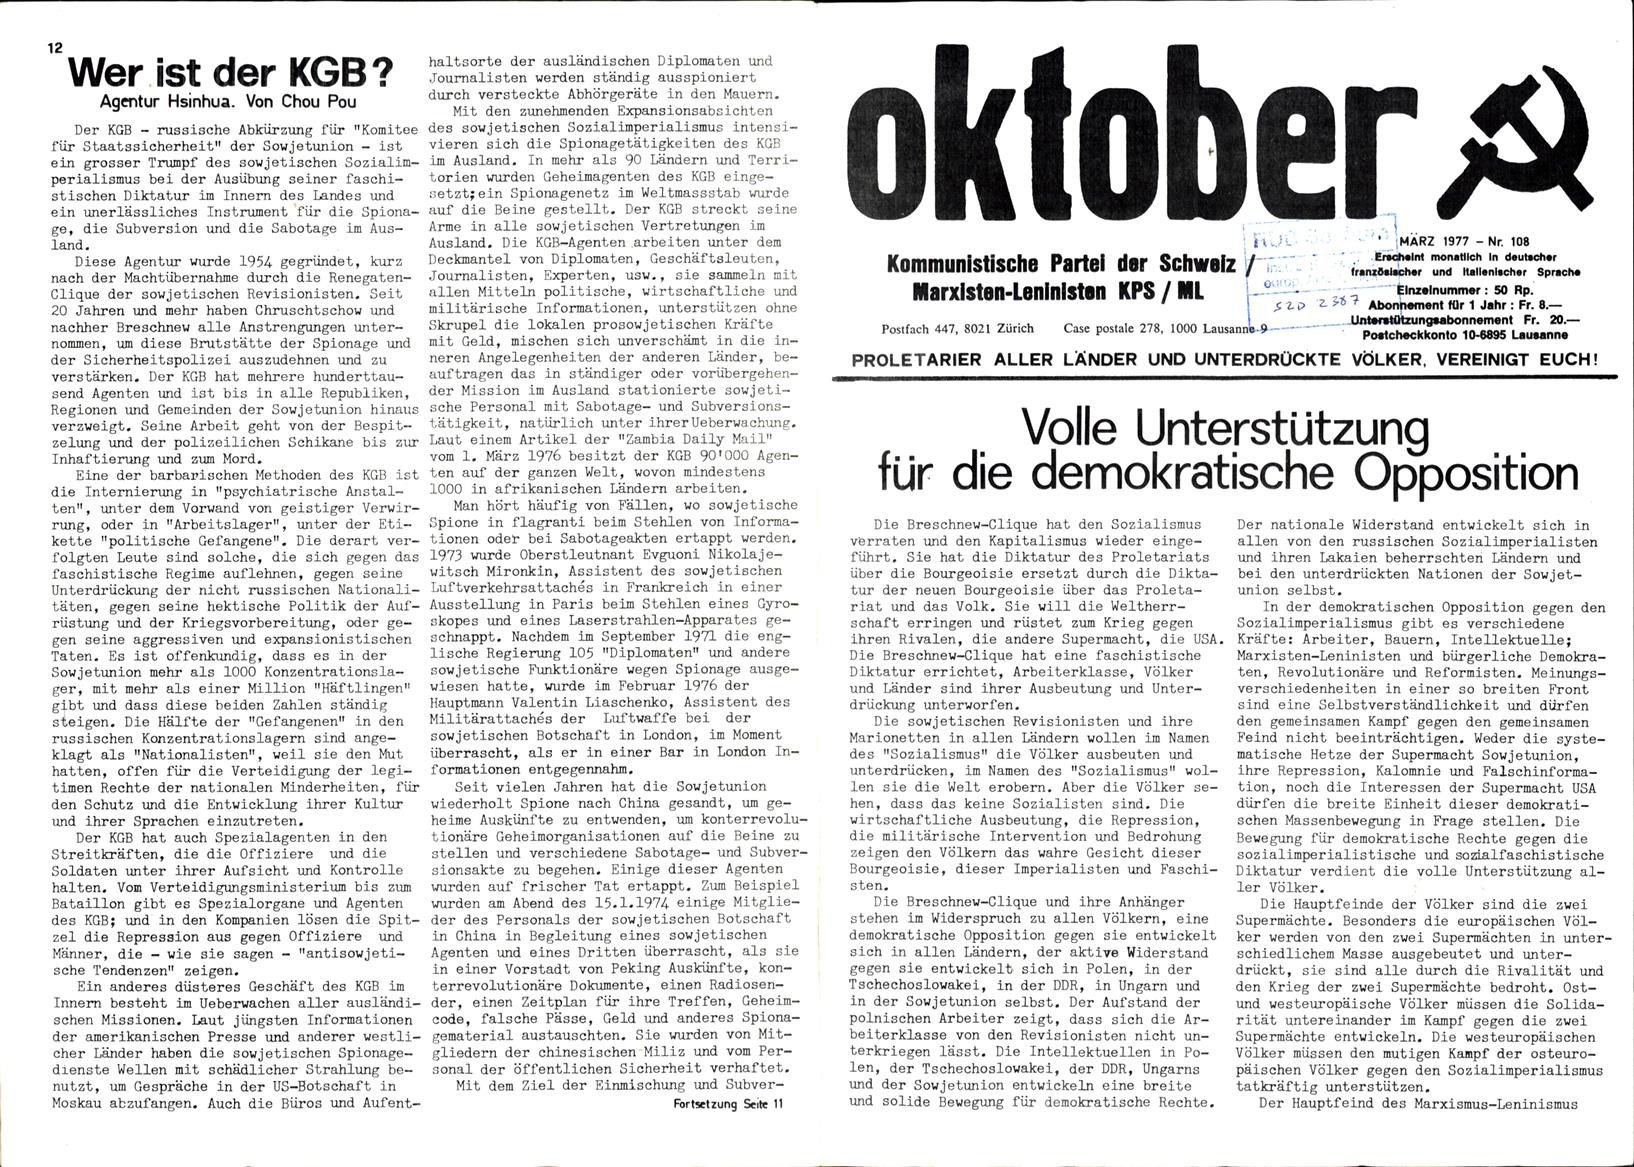 Schweiz_KPSML_Oktober_19770300_108_001